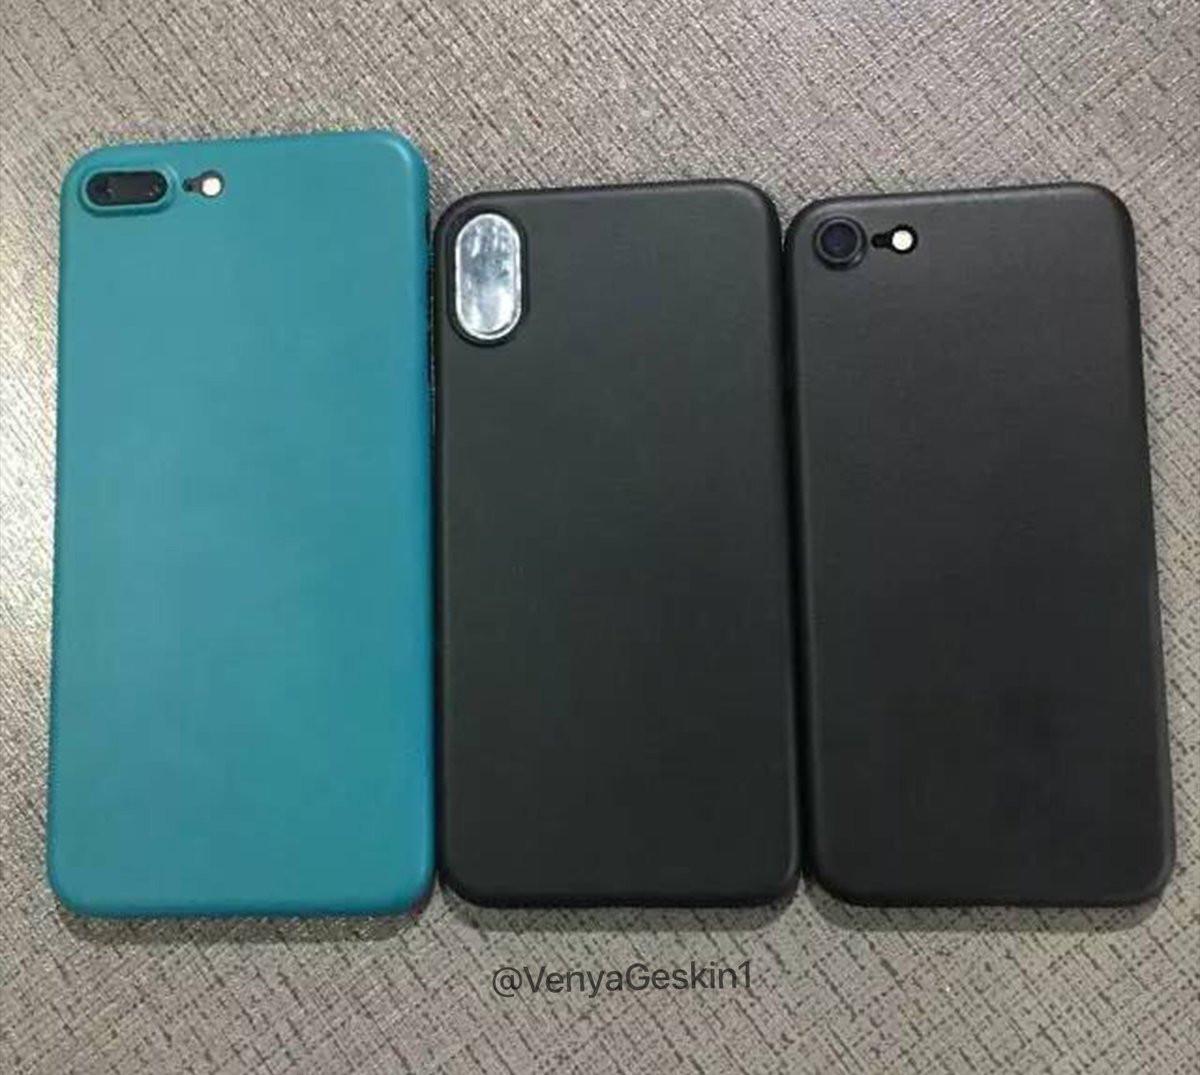 1497592959_iphone-8-leak-reveals-final-dimensions-vertical-dual-camera-of-oled-model-516483-5.jpg